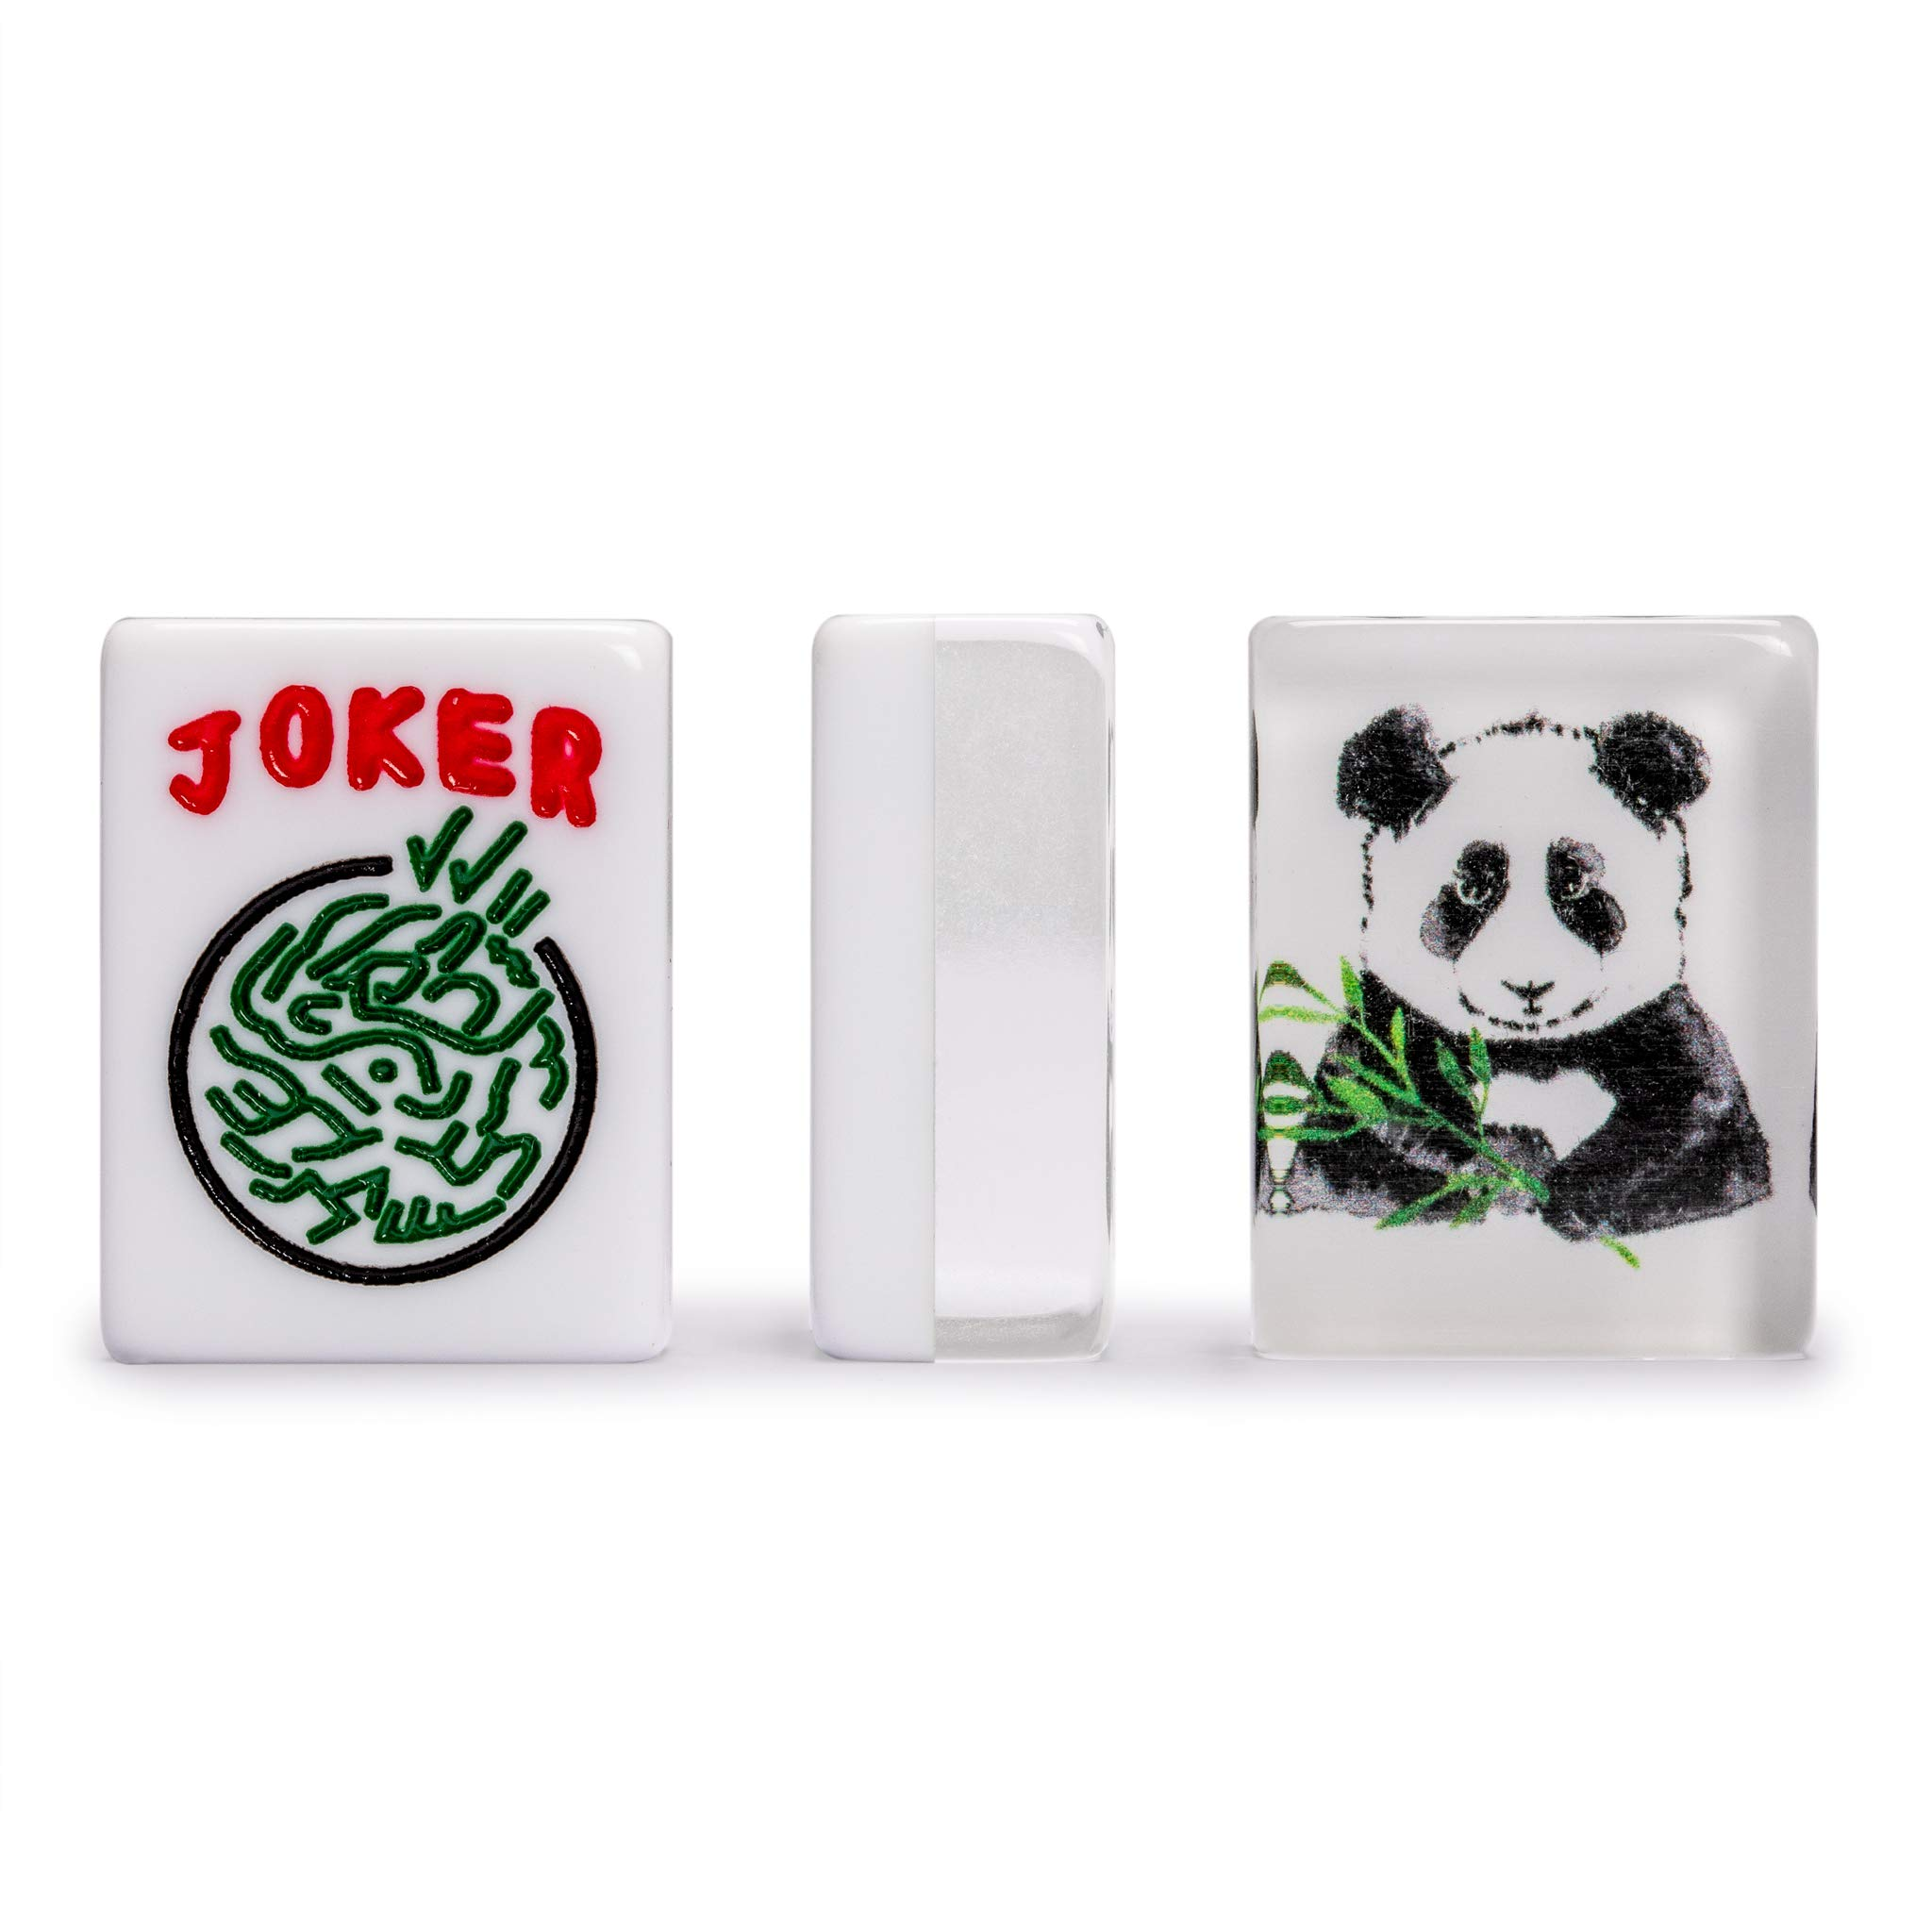 Yellow Mountain Imports American Mahjong Tiles, Panda - 1.2 x 0.9 x 0.5 inches (30 cm x 23 cm x 13 cm) - 166 Acrylic Standard Size Mahjong Tiles